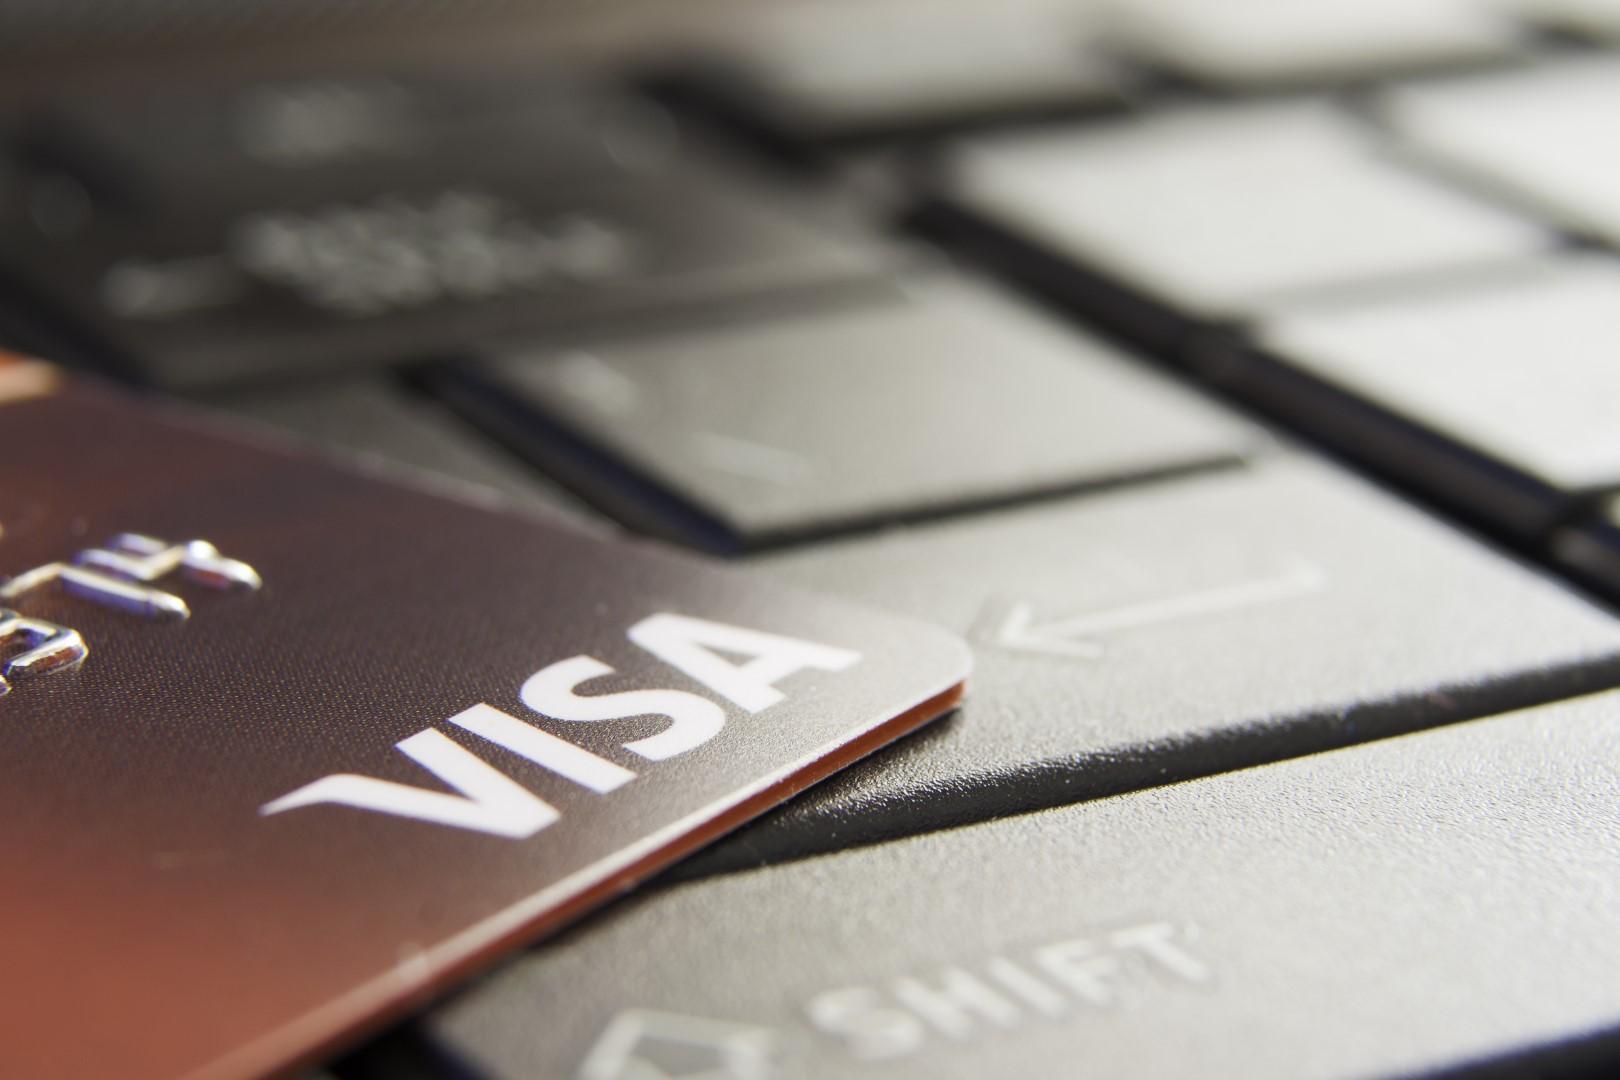 Arab Bank launches Visa Signature Credit Card for Elite customers